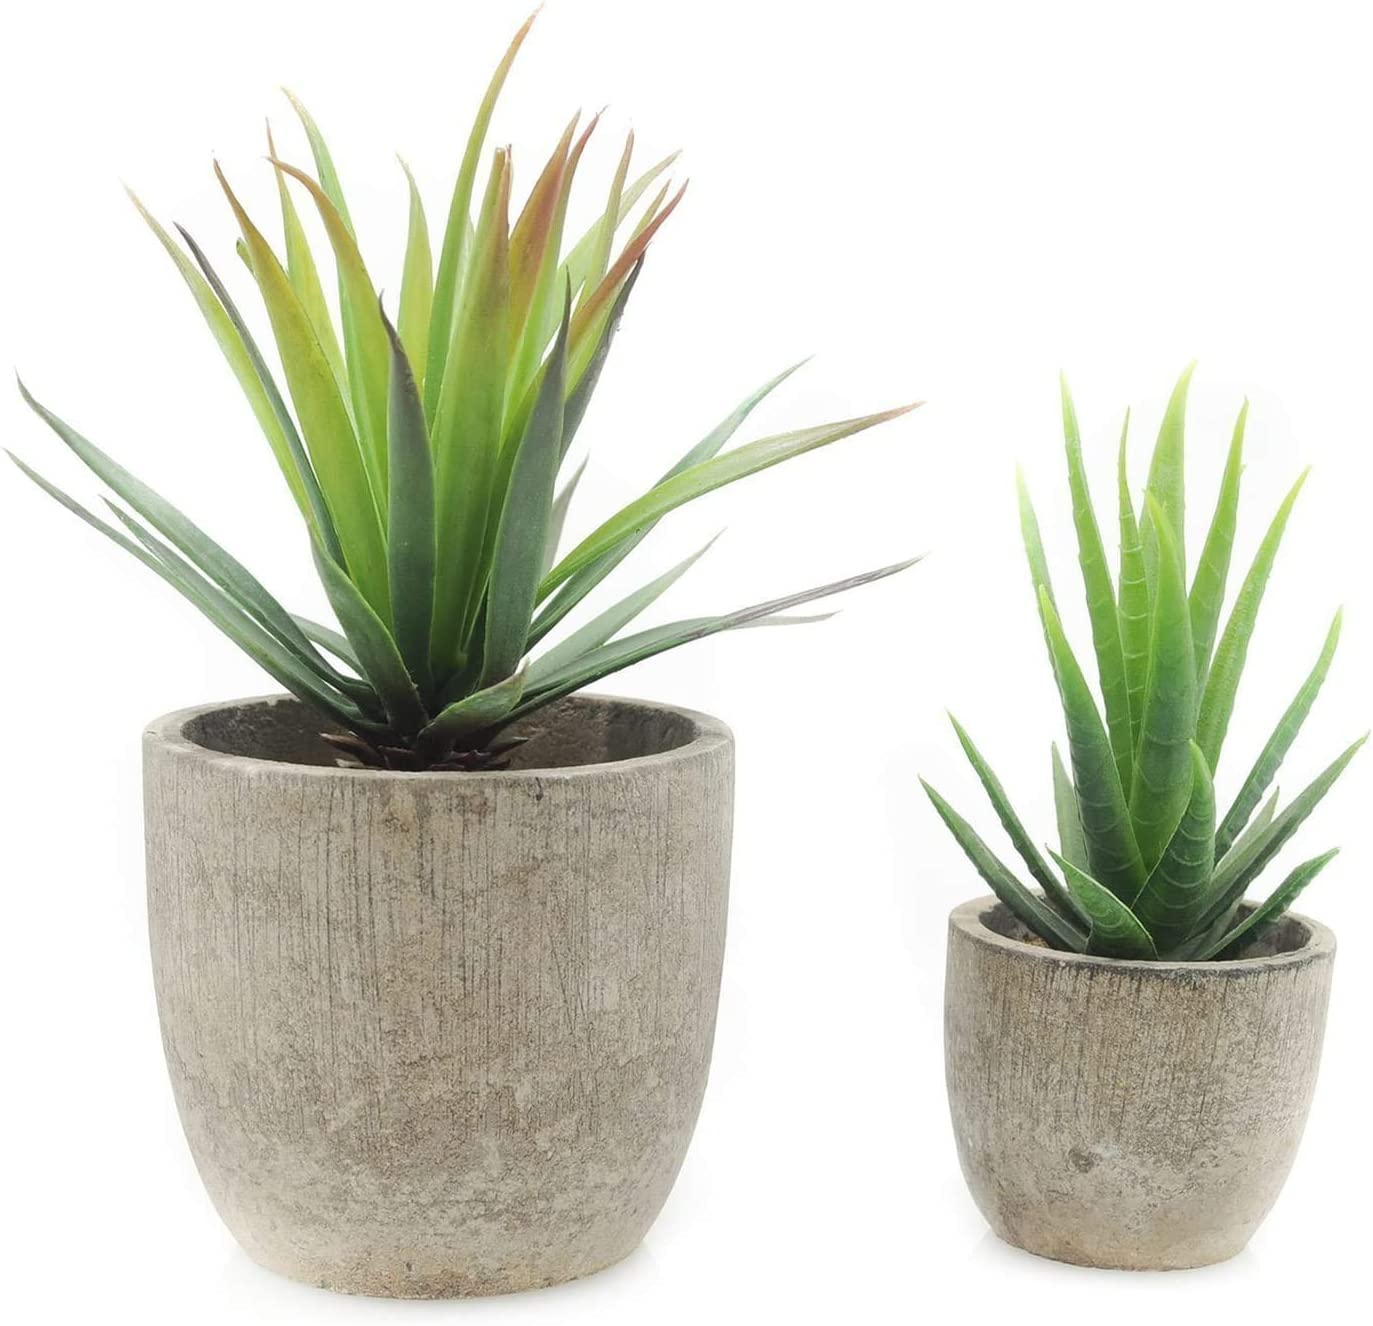 Amazon Com Velener Mini Home Decoration Artificial Plants Aloe With Pots Set Of 2 Furniture Decor